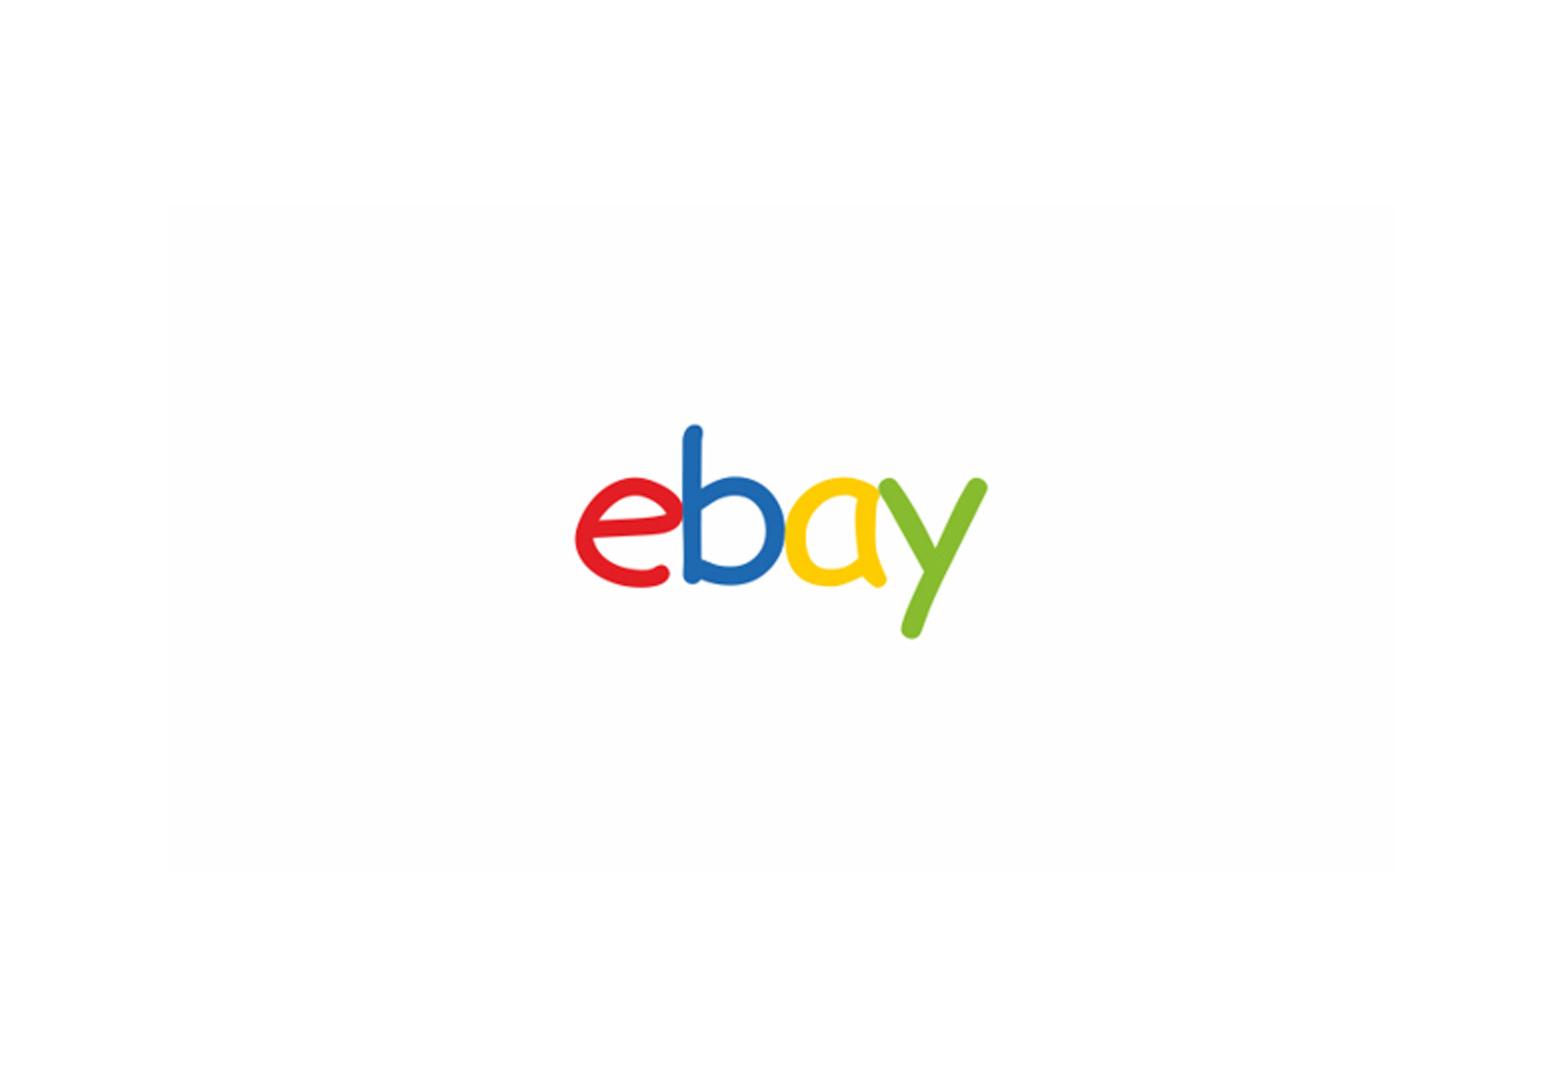 ebay-comic-sans-logo11